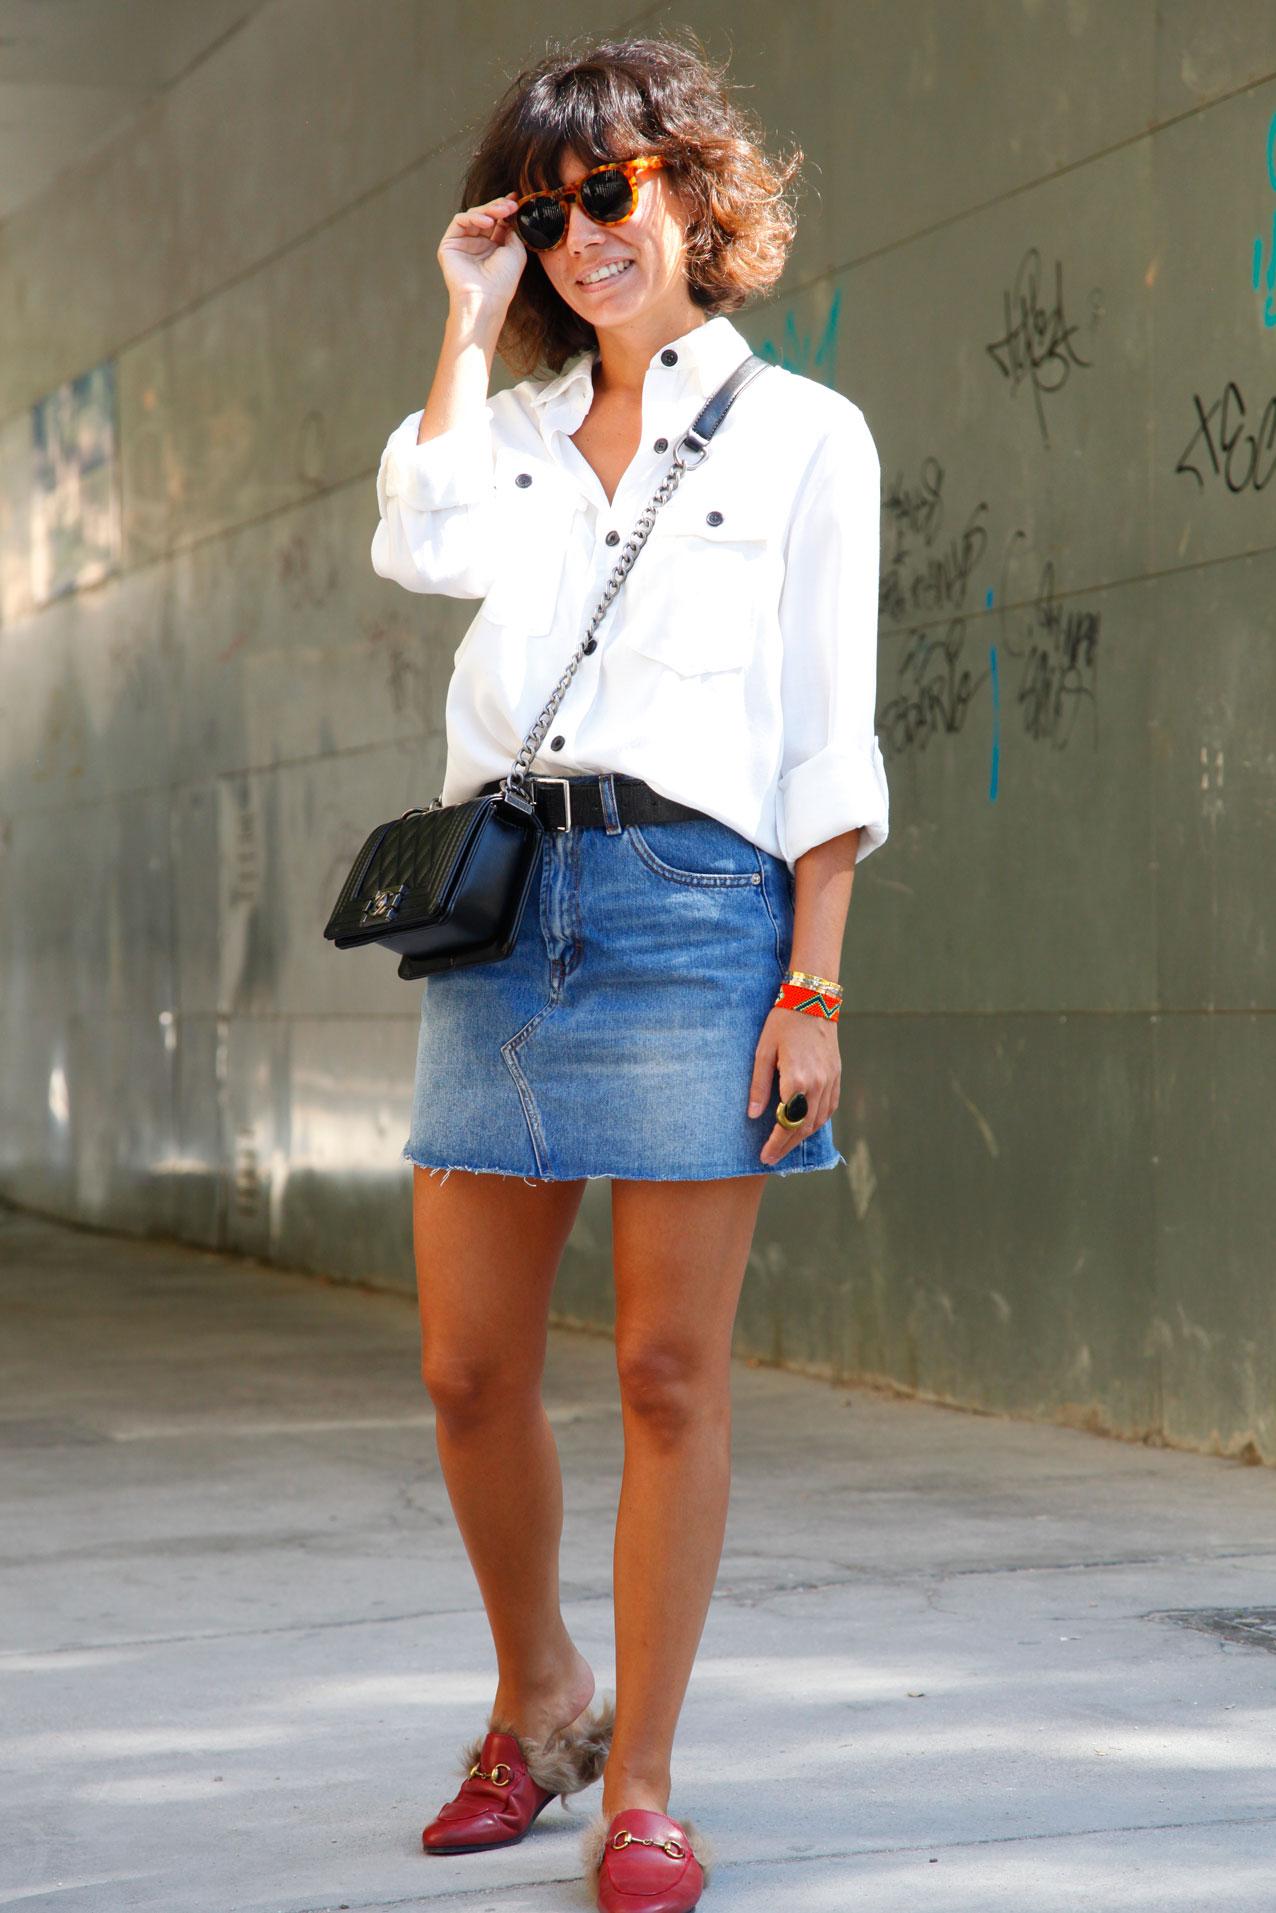 gucci_slippers_adn_denim_skirt_look-cool_lemonade3